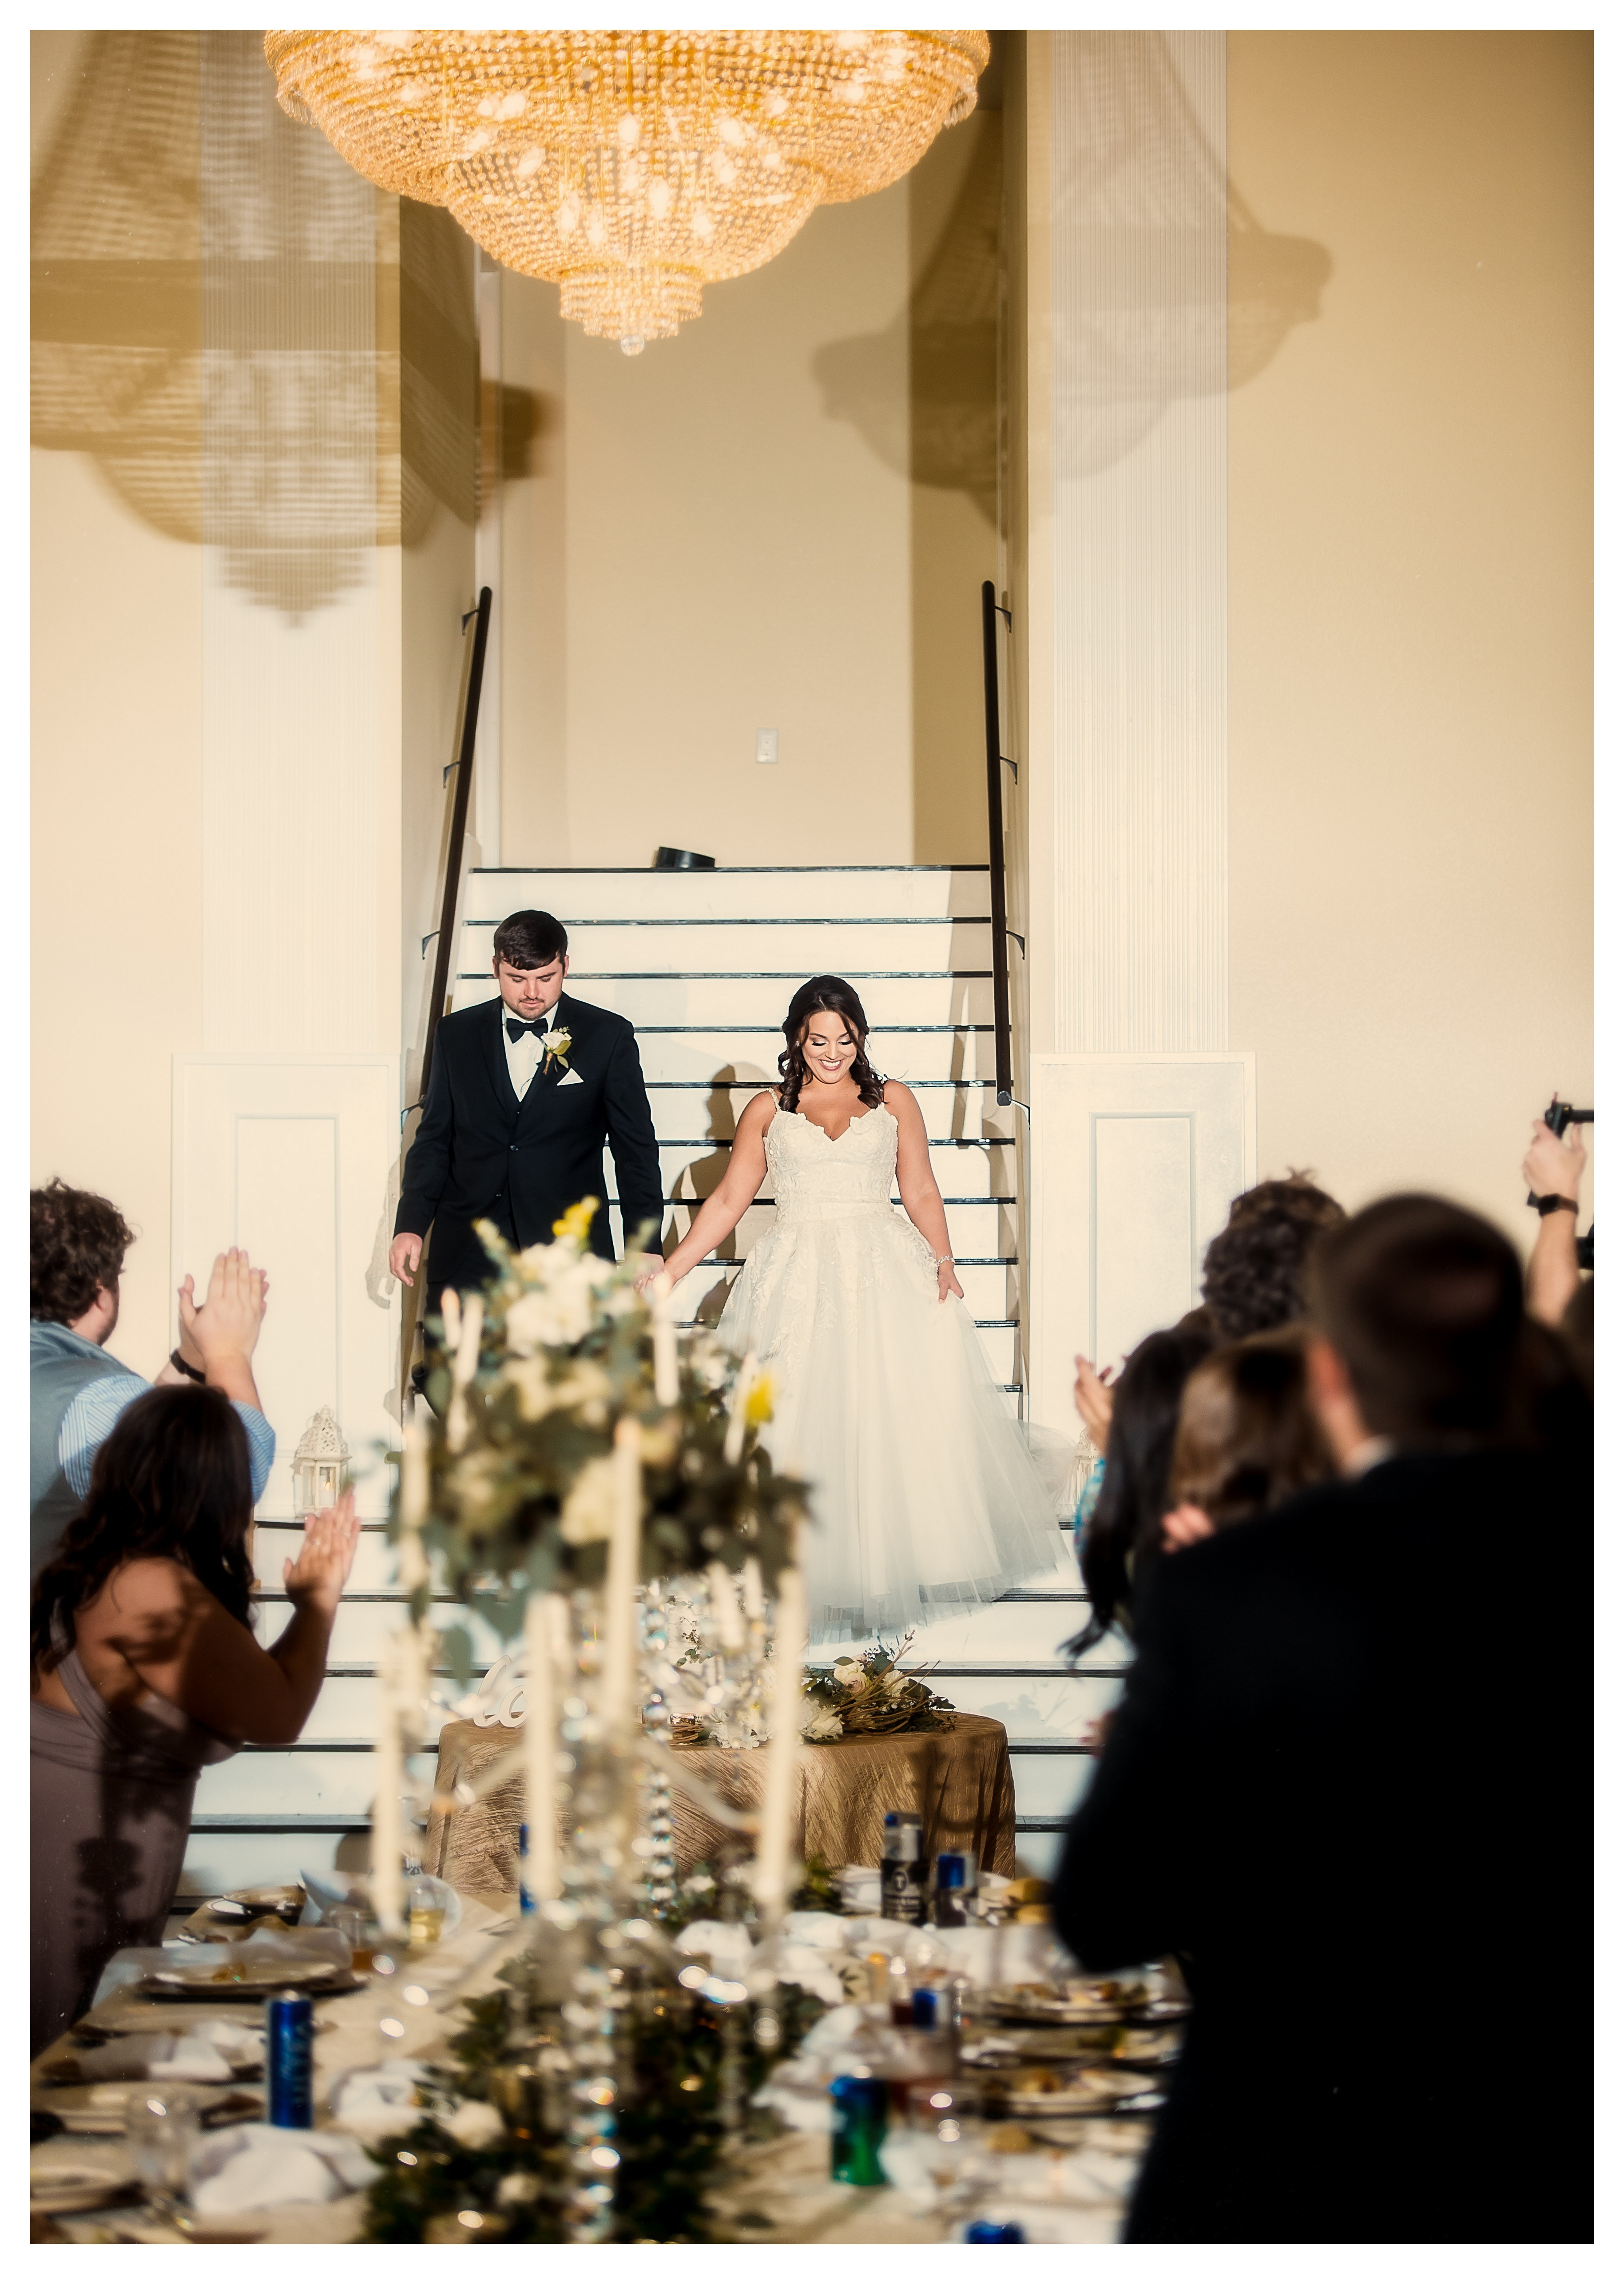 LIVE_FINAL_WEDDING_LANE_CHELSEY13